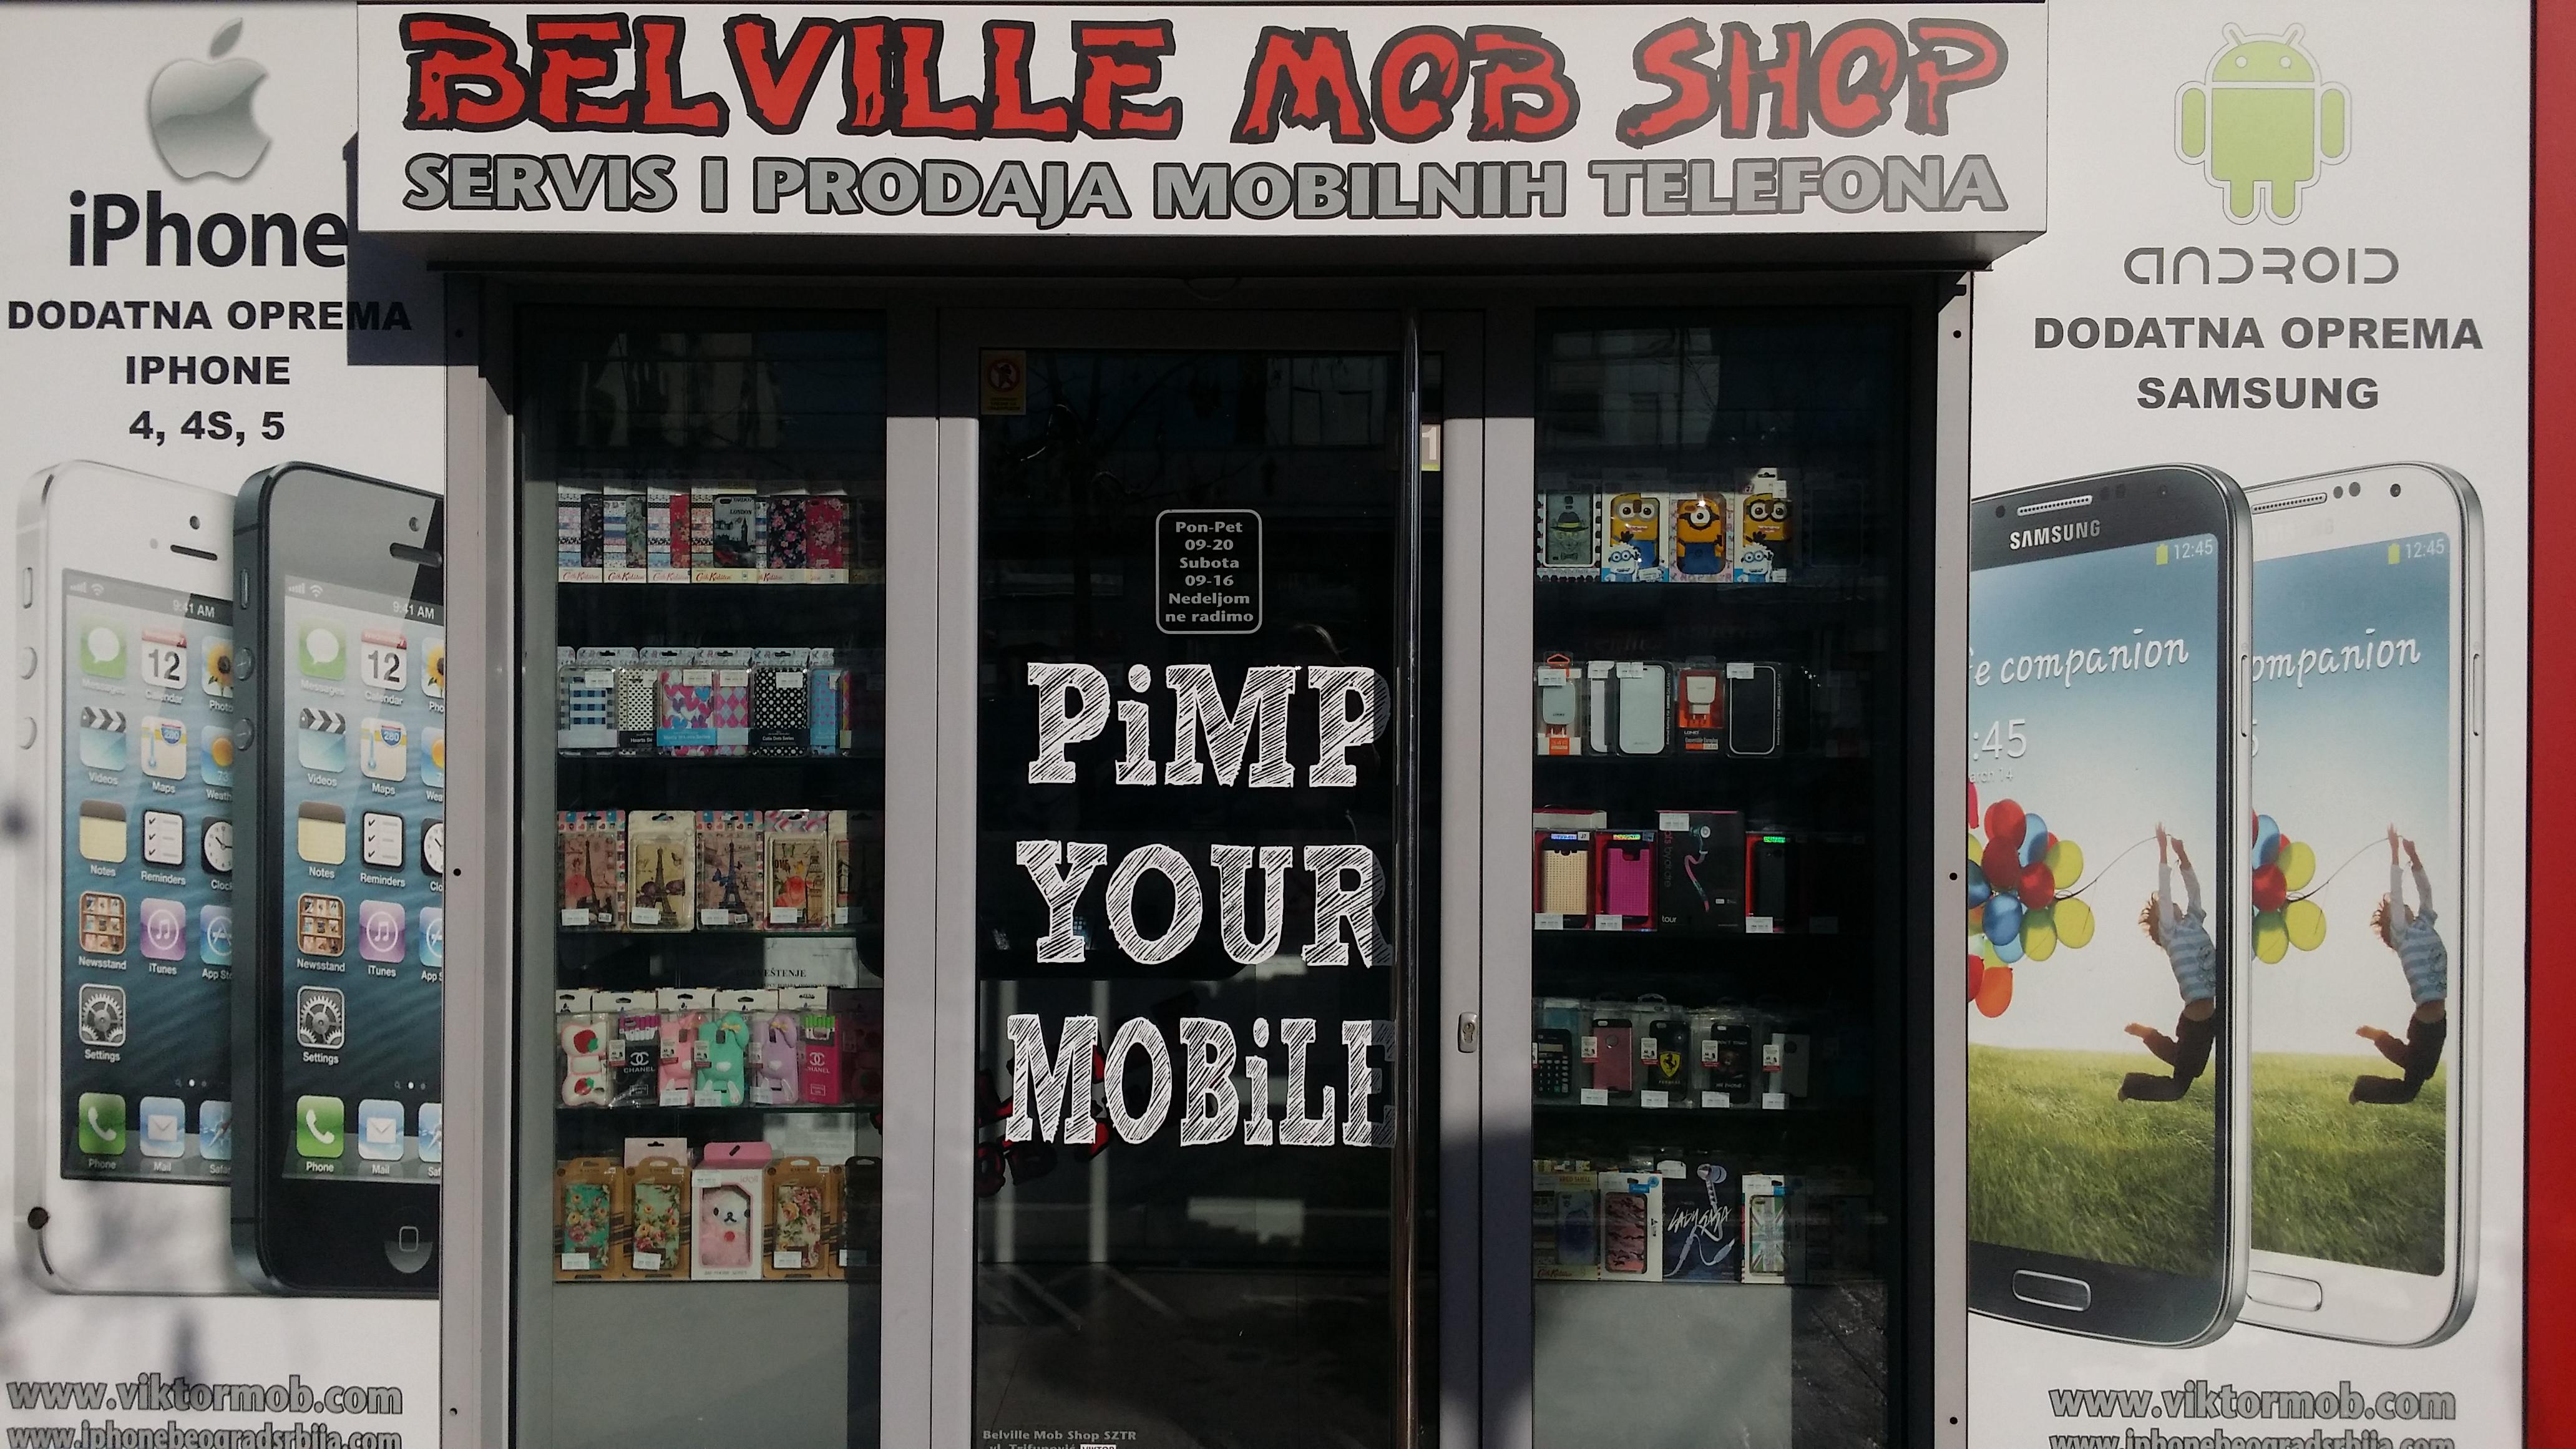 Servis i prodaja mobilnih telefona Viktormob